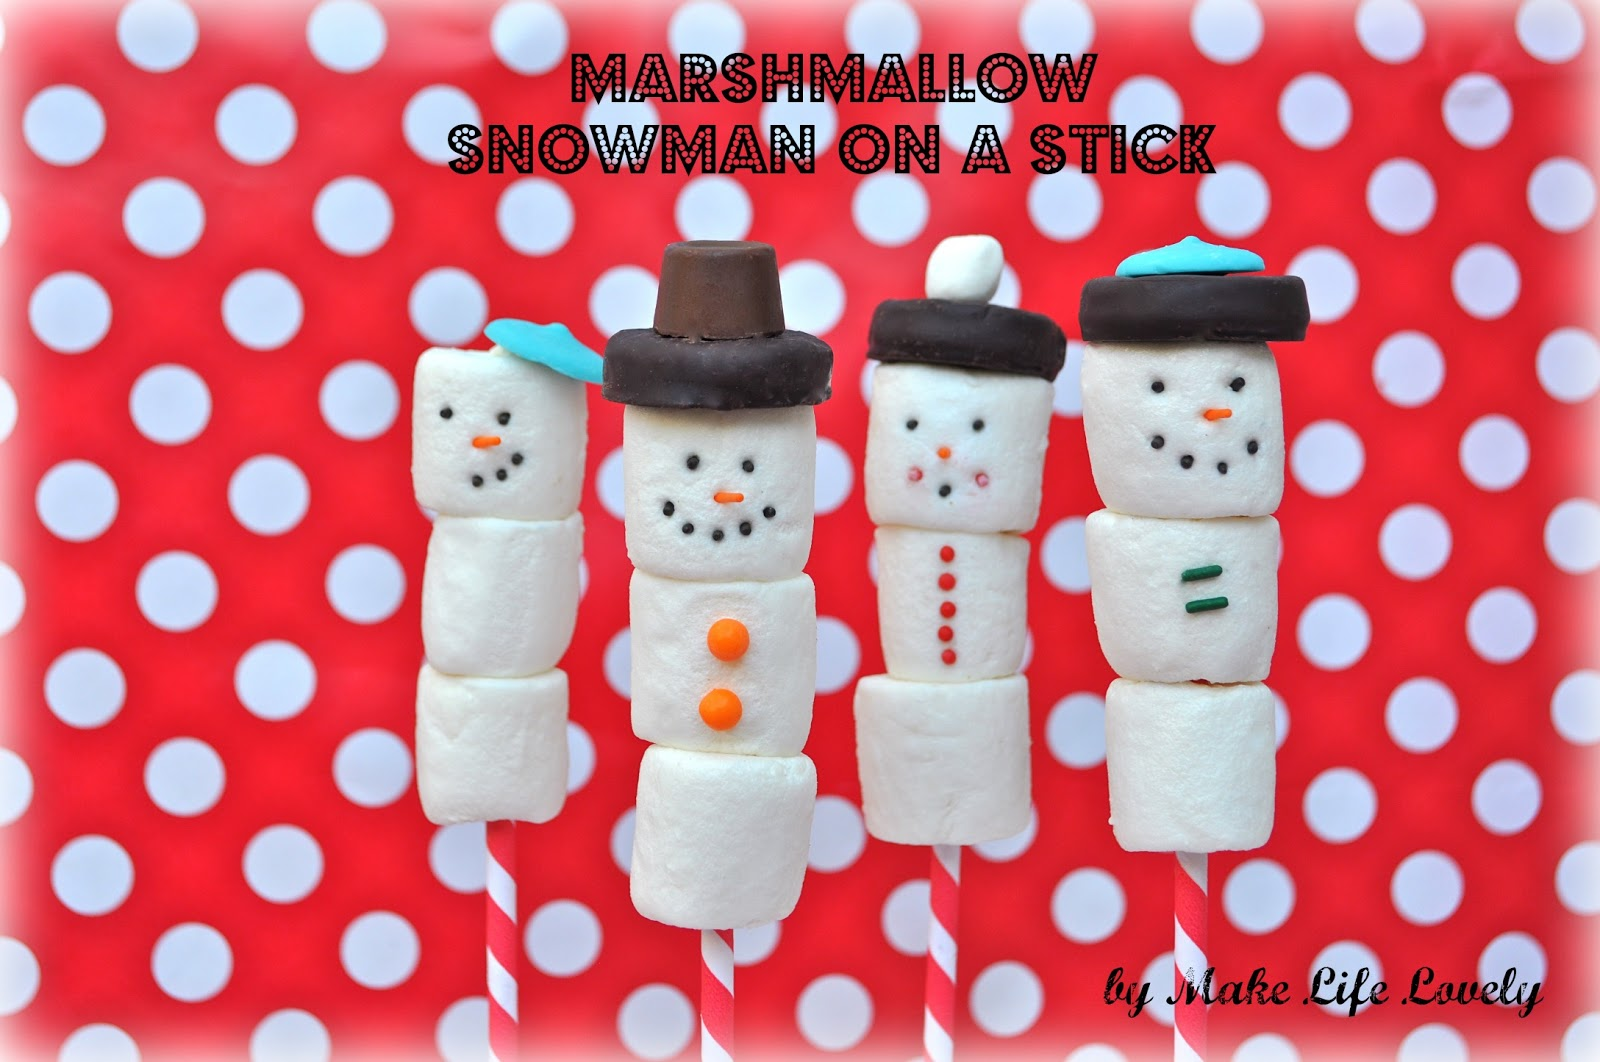 marshmallow snowman on a stick make life lovely